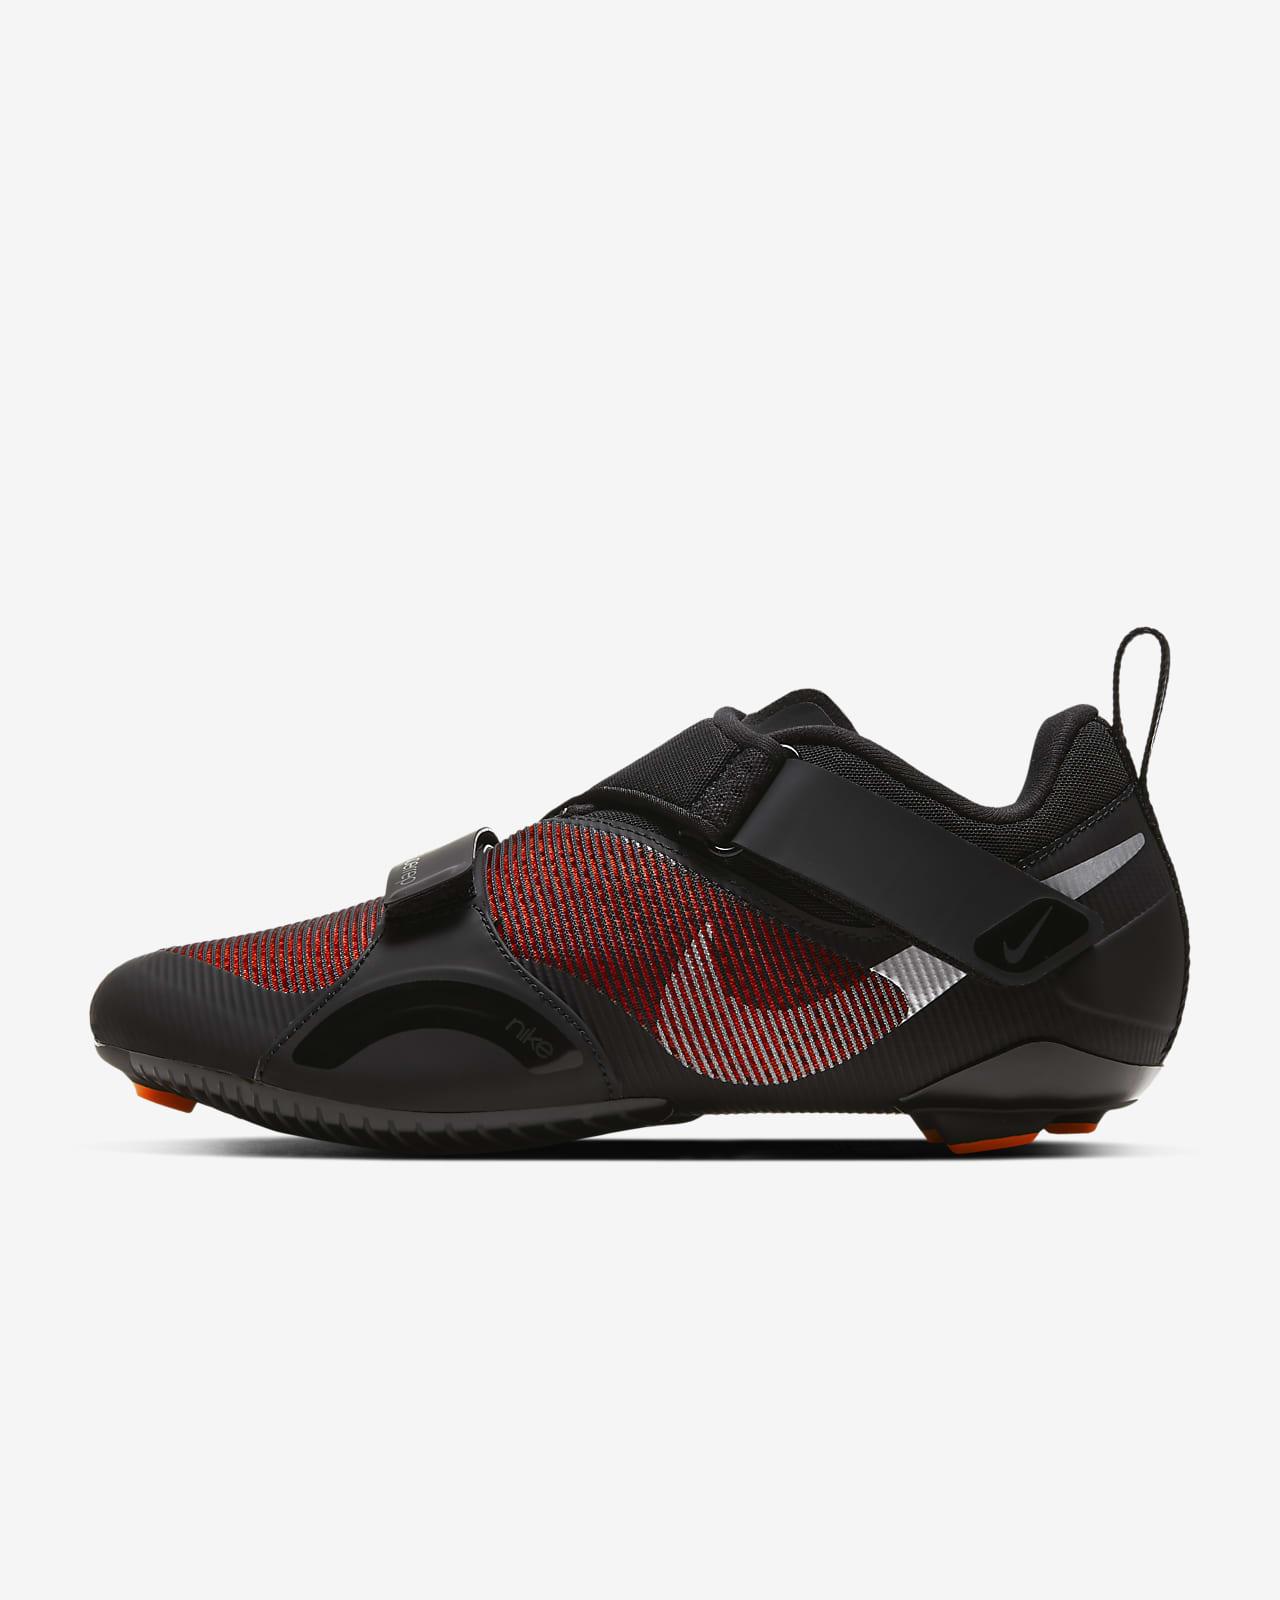 Nike superrep cycle cj0775-660 Flash Crimson